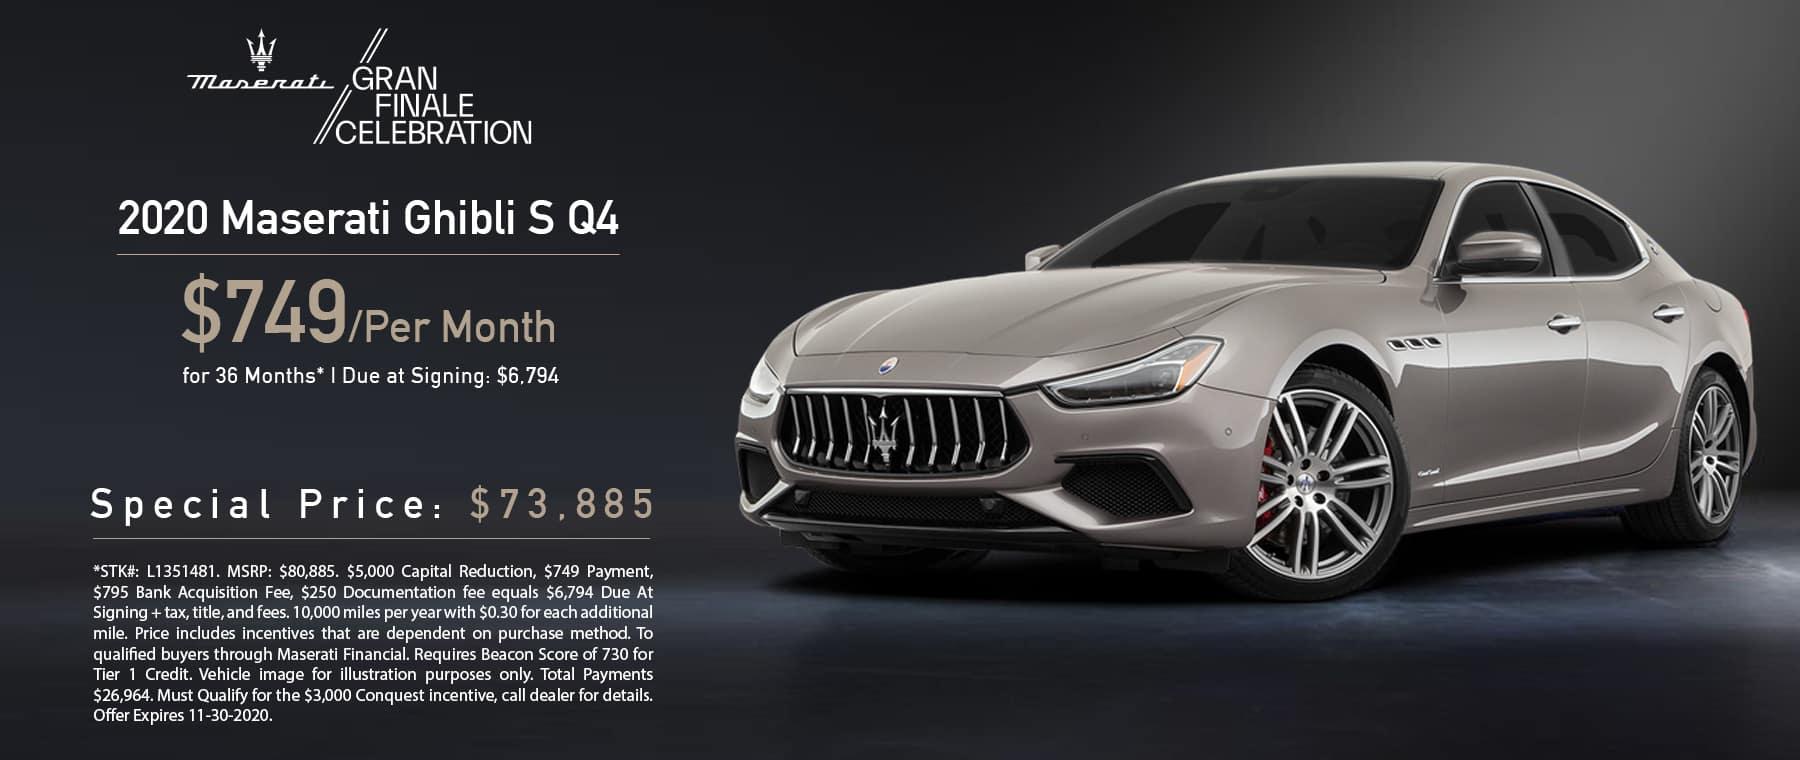 Maserati_2020_Ghibli_Slide_Nov2020_1